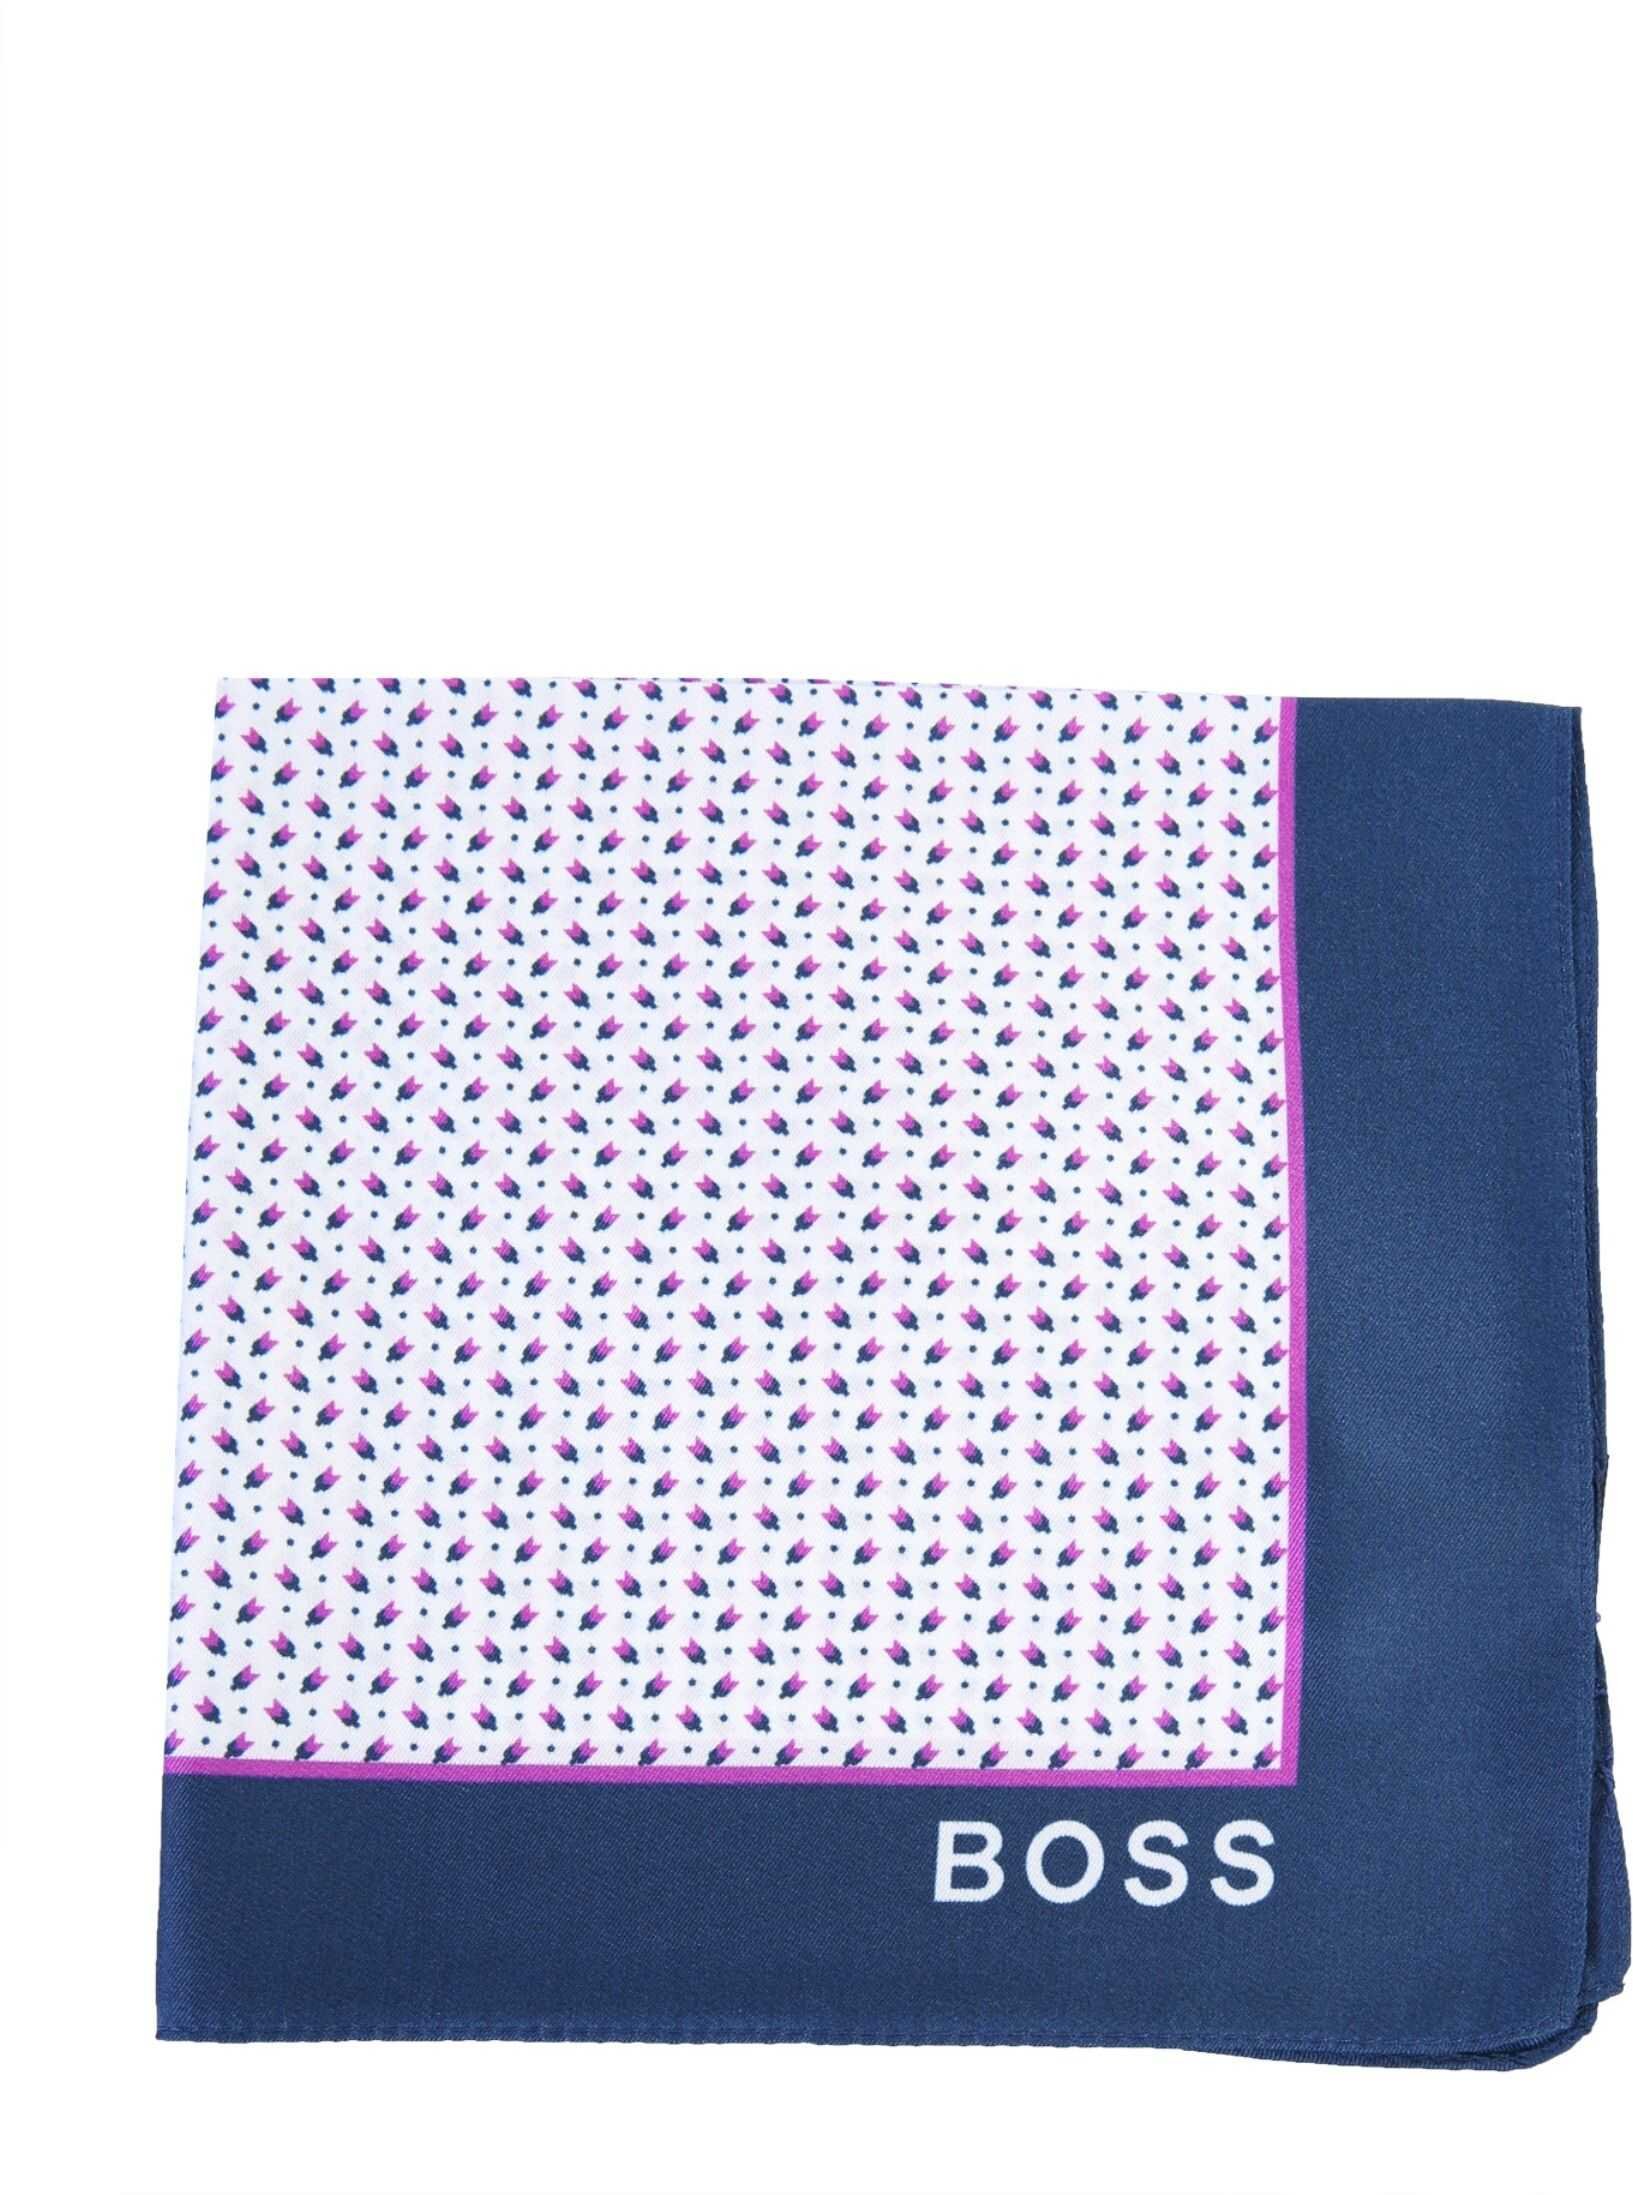 BOSS Printed Scarf PINK